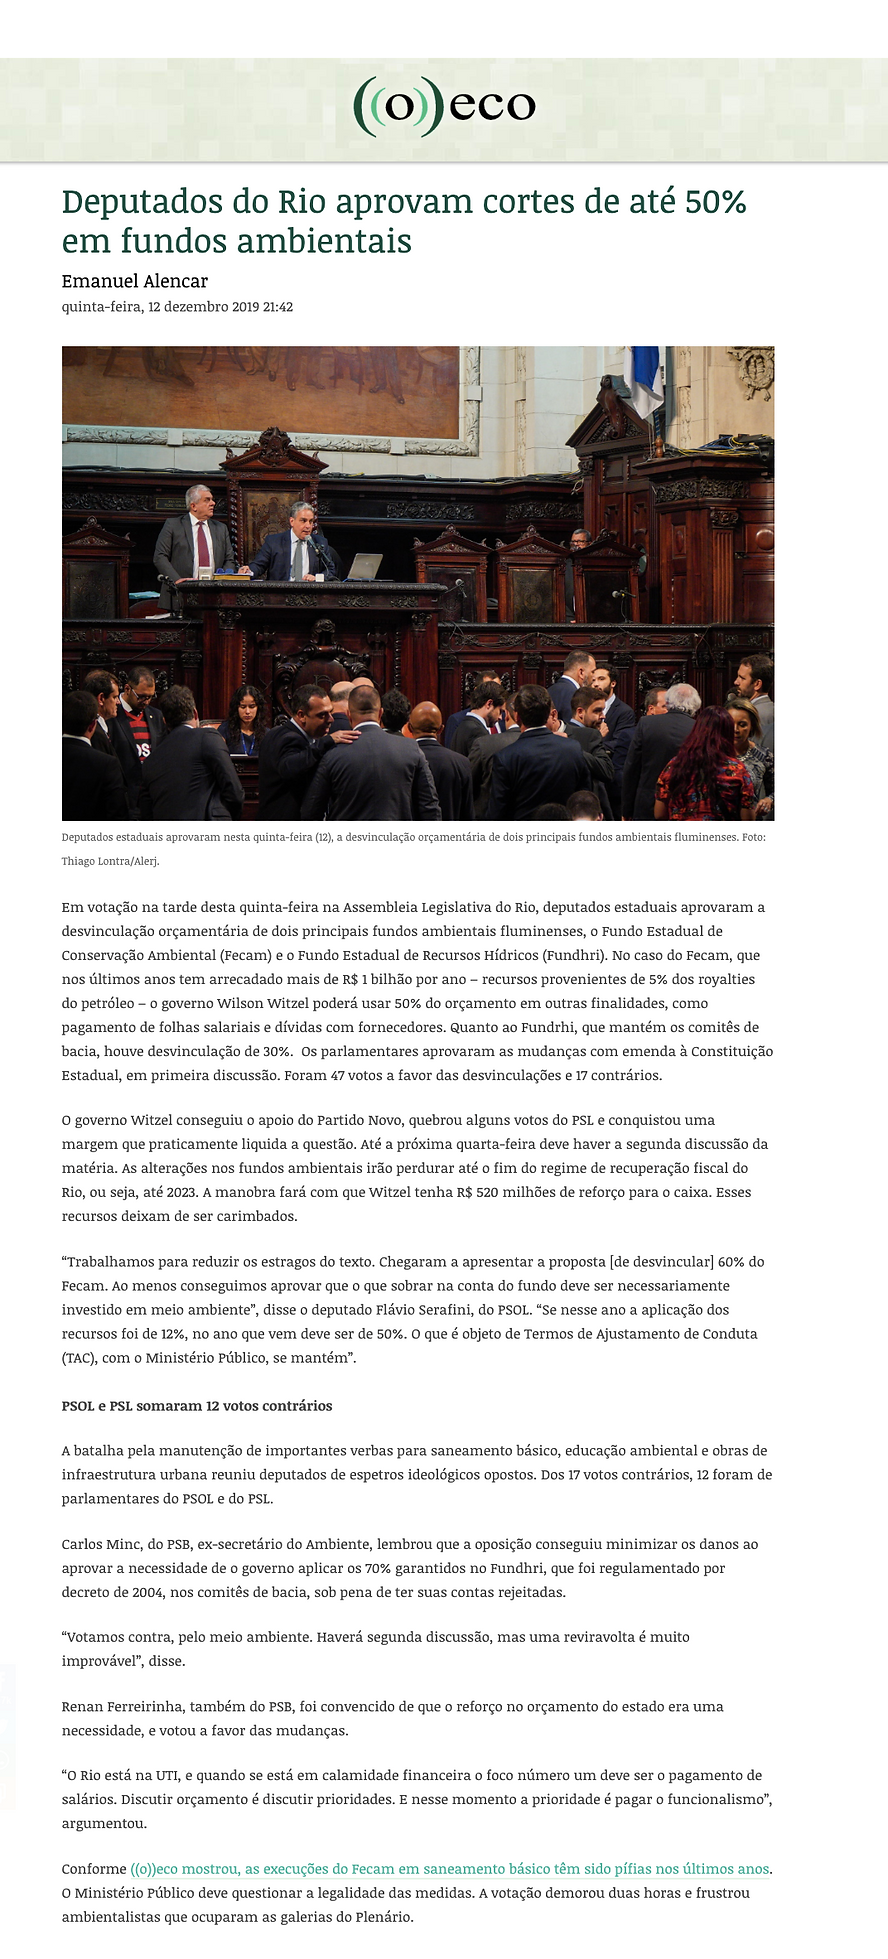 screenshot-www.oeco.org.br-2019.12.png